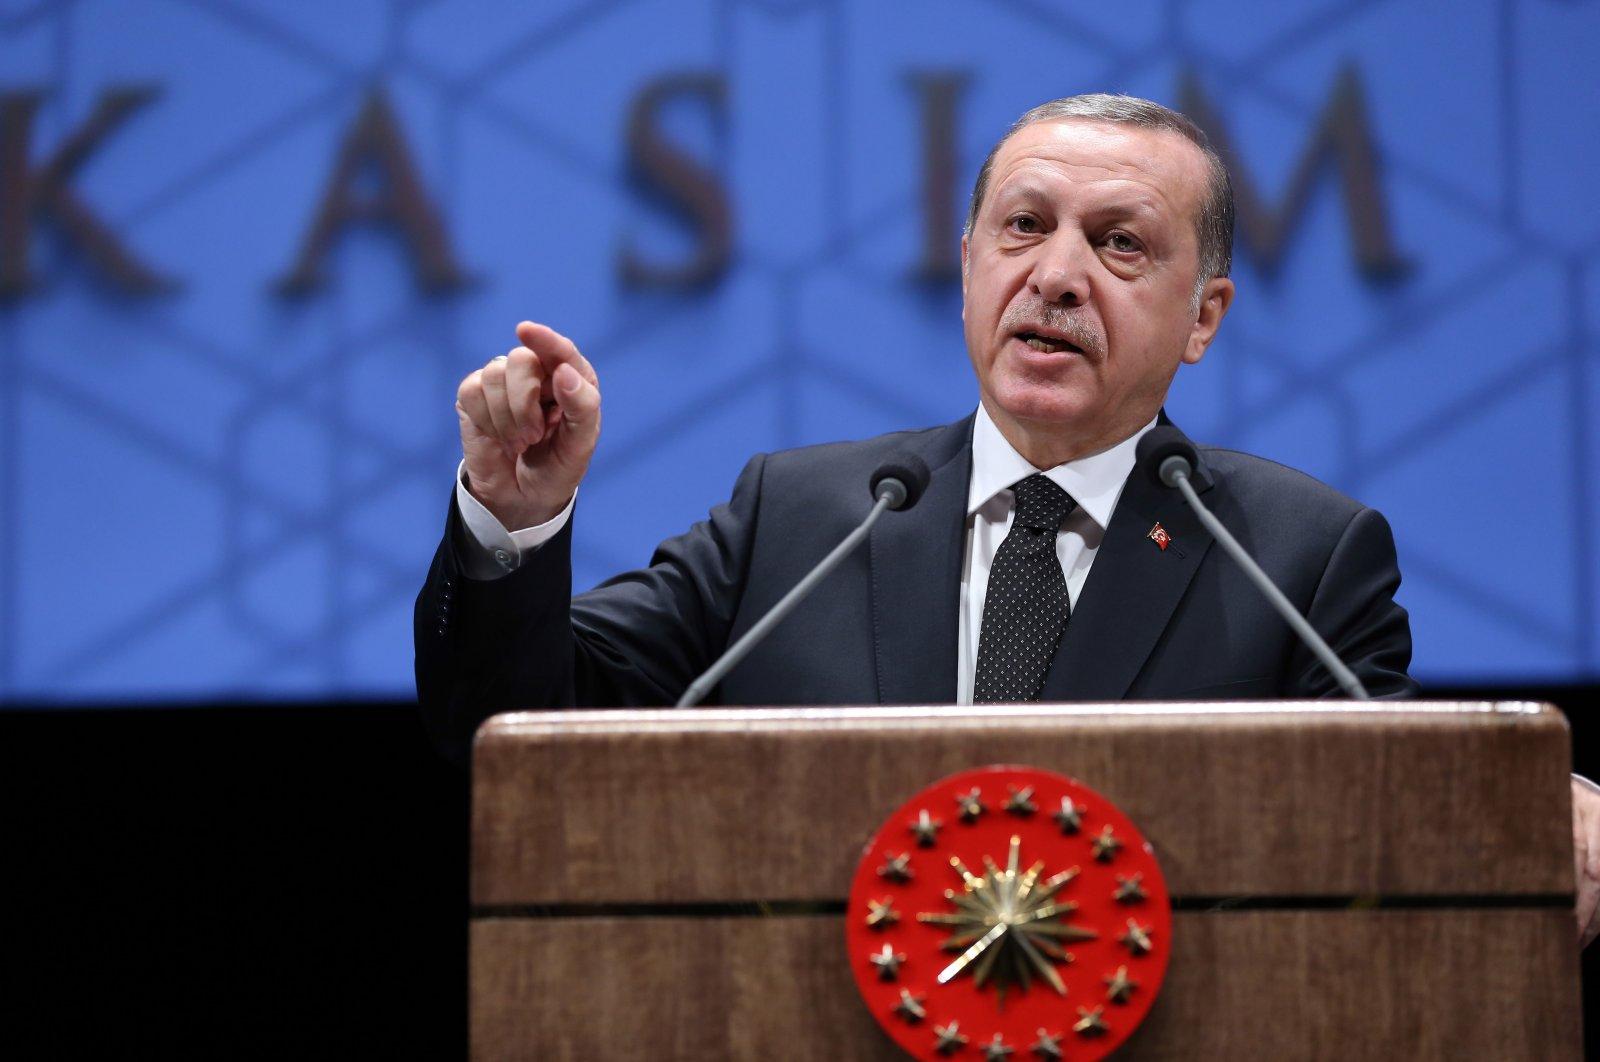 President Recep Tayyip Erdoğan speaks at the commemoration ceremony to mark Turkey's founder Mustafa Kemal Atatürk's death at the Beştepe Cultural Center in Ankara, Turkey, May 21, 2021. (AA Photo)